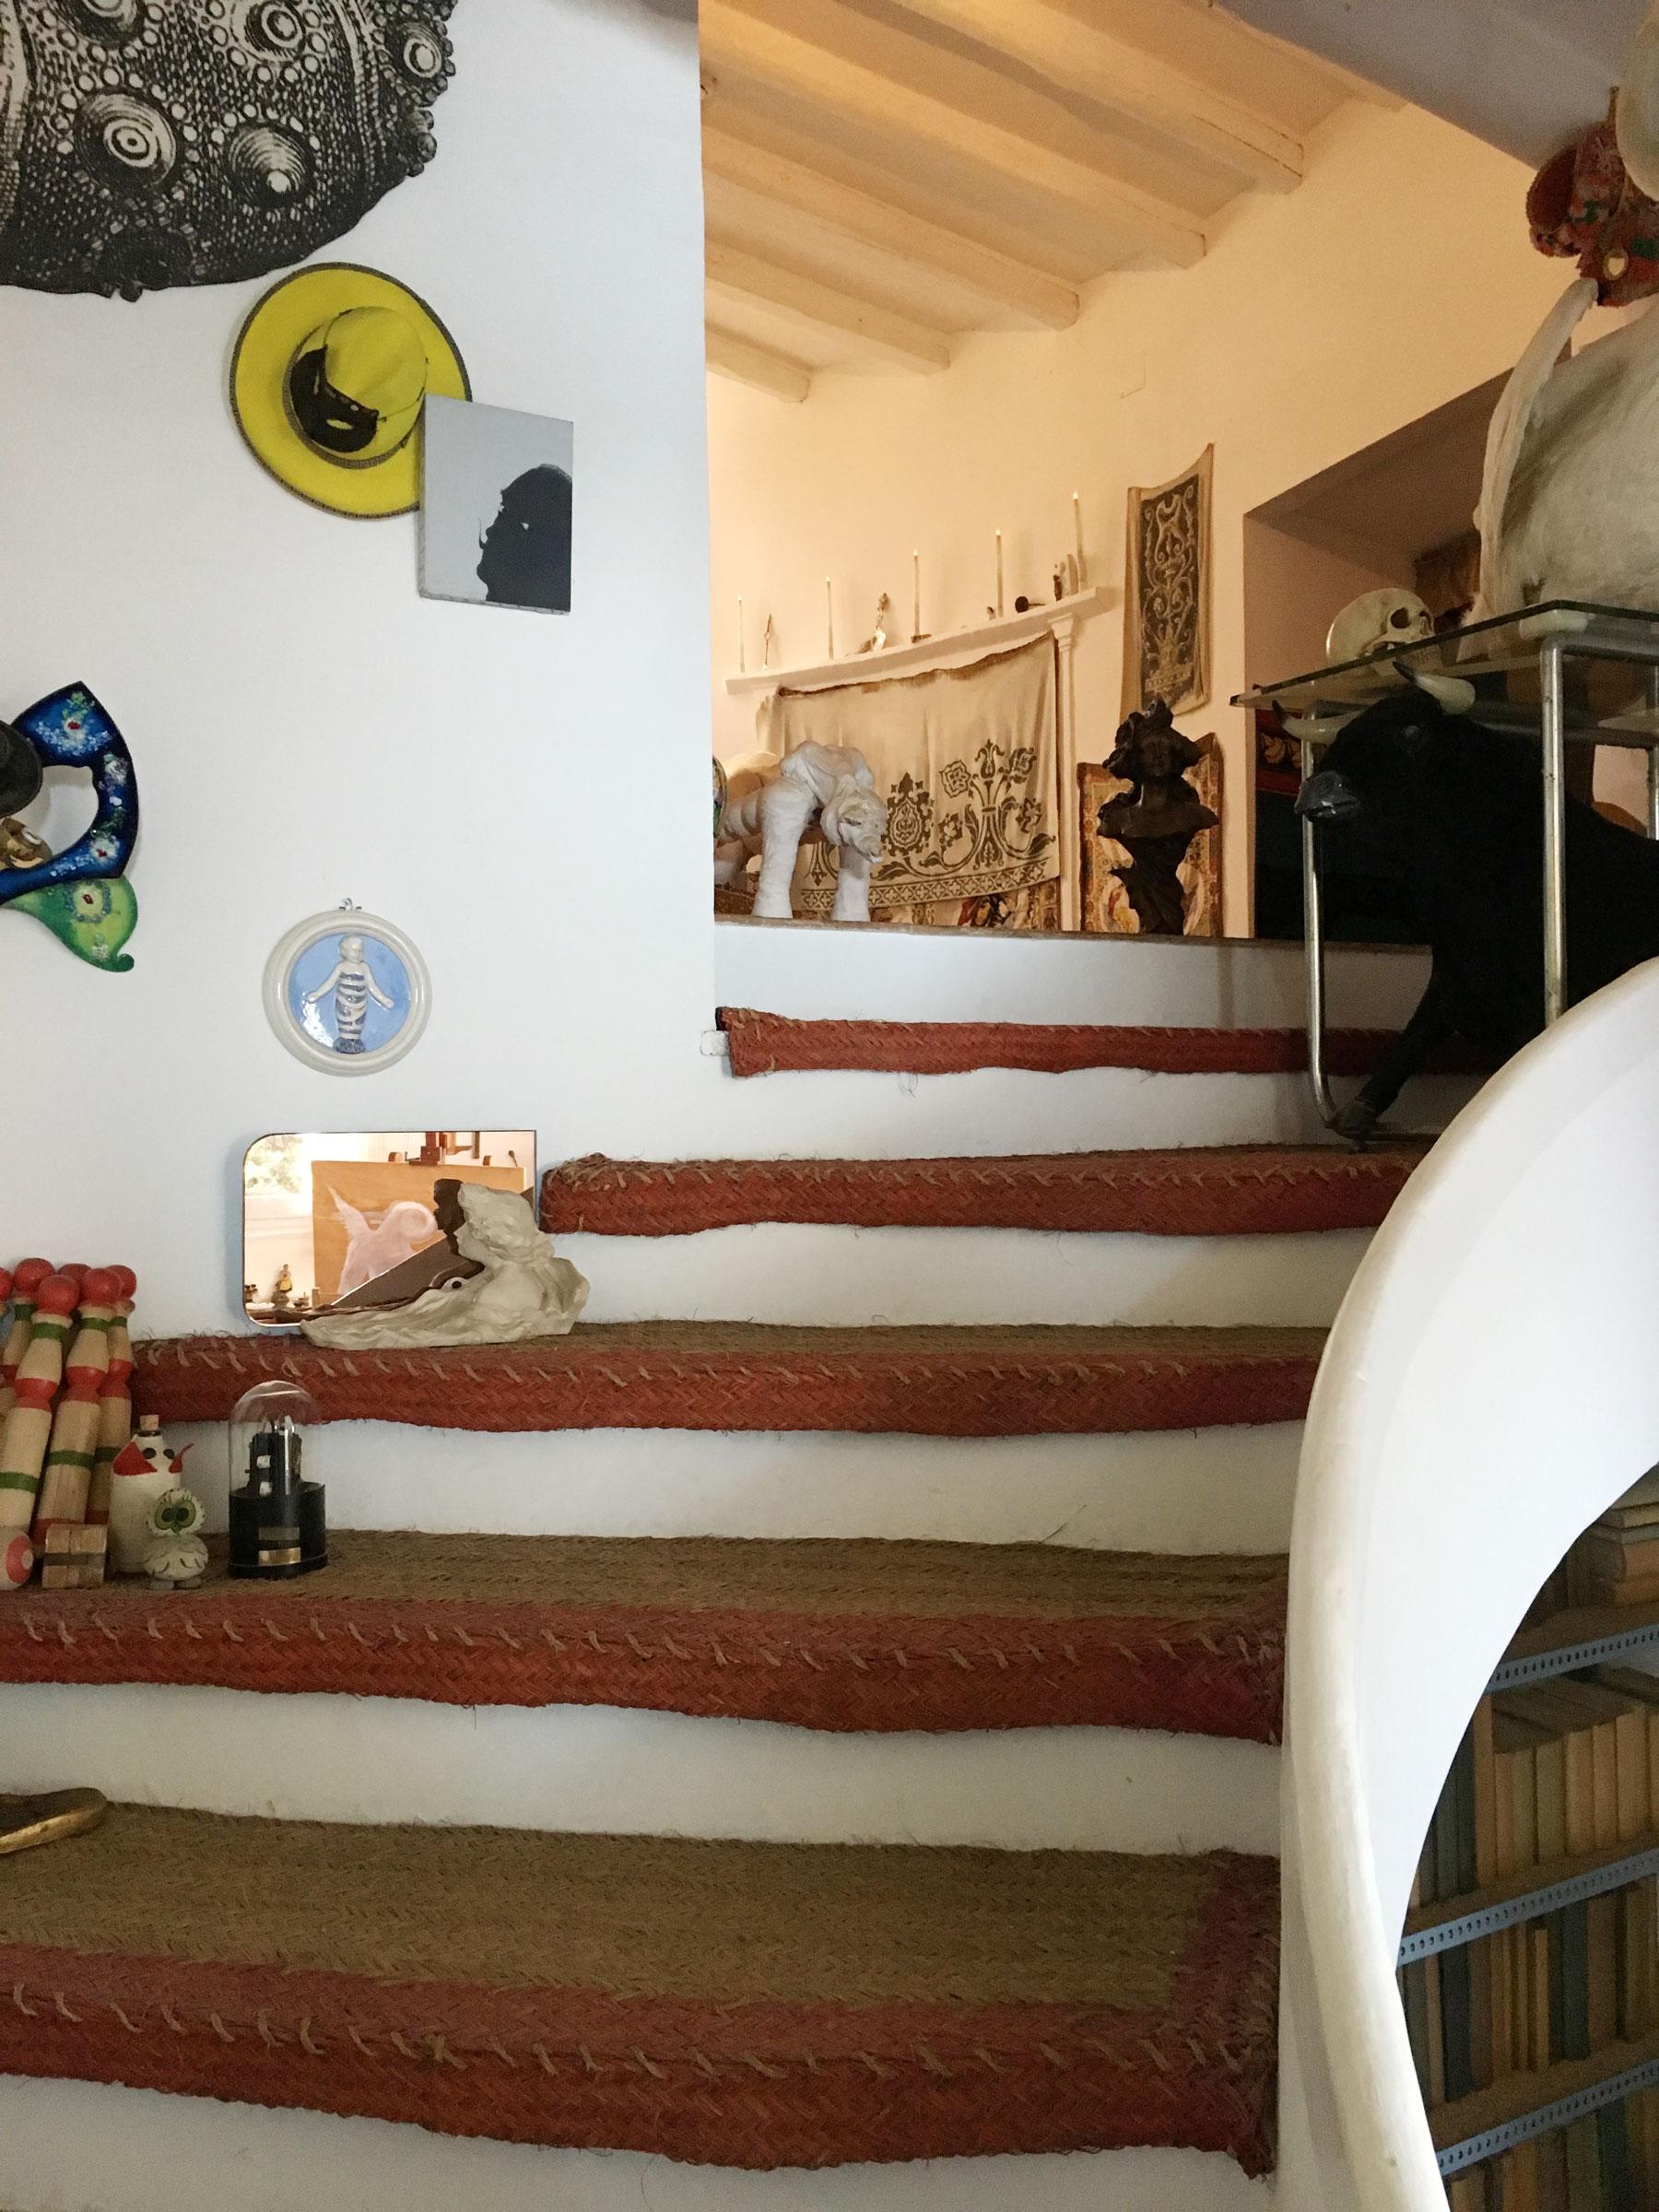 Day trip from Barcelona - Casa Dali, Port Lligat. #casadali #dalishouse #portlligat #daytripsfrombarcelona